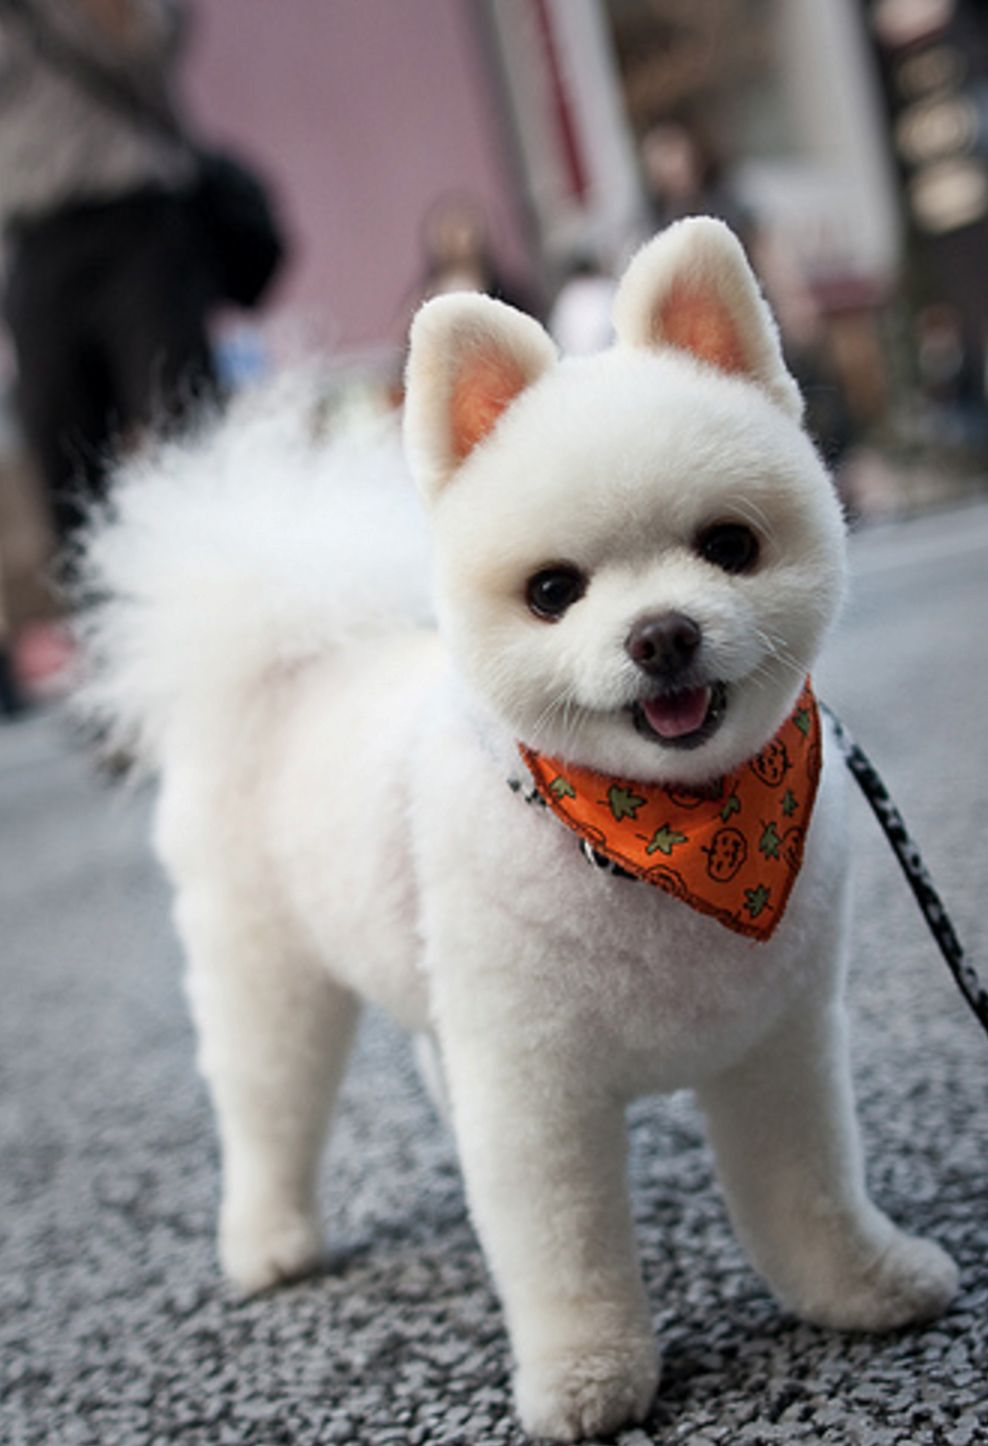 Pomeranian With A Shiba Inu Haircut Too Cute For Words